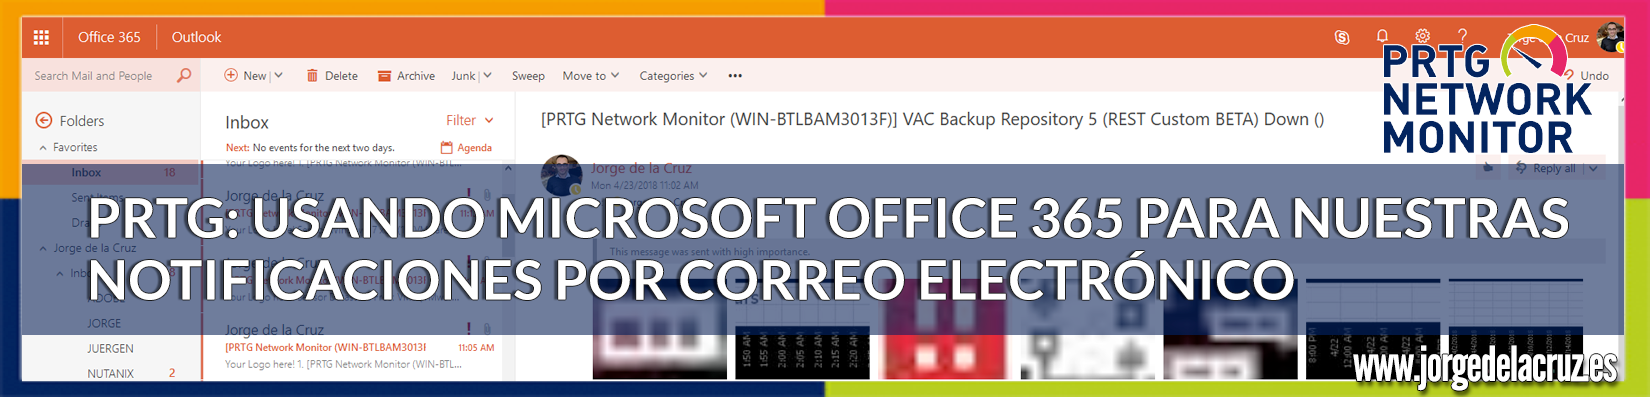 PRTG: Usando Microsoft Office 365 para nuestras